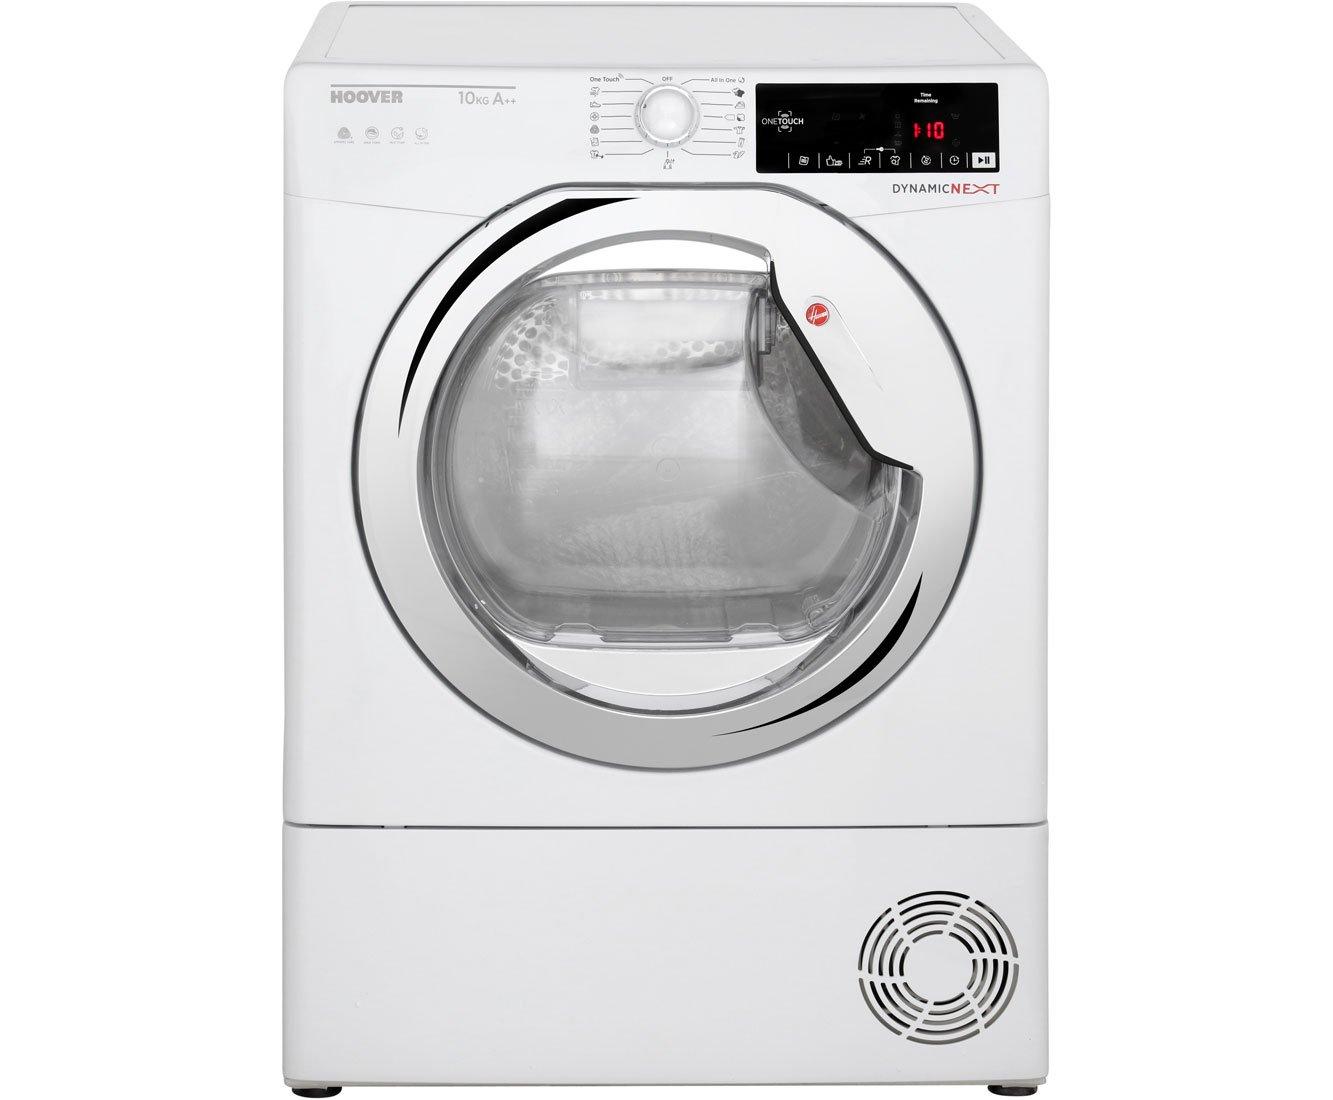 Hoover-DX-h10-a2tcex-s-10-kg-Waschmaschine–Waschmaschinen-10-kg